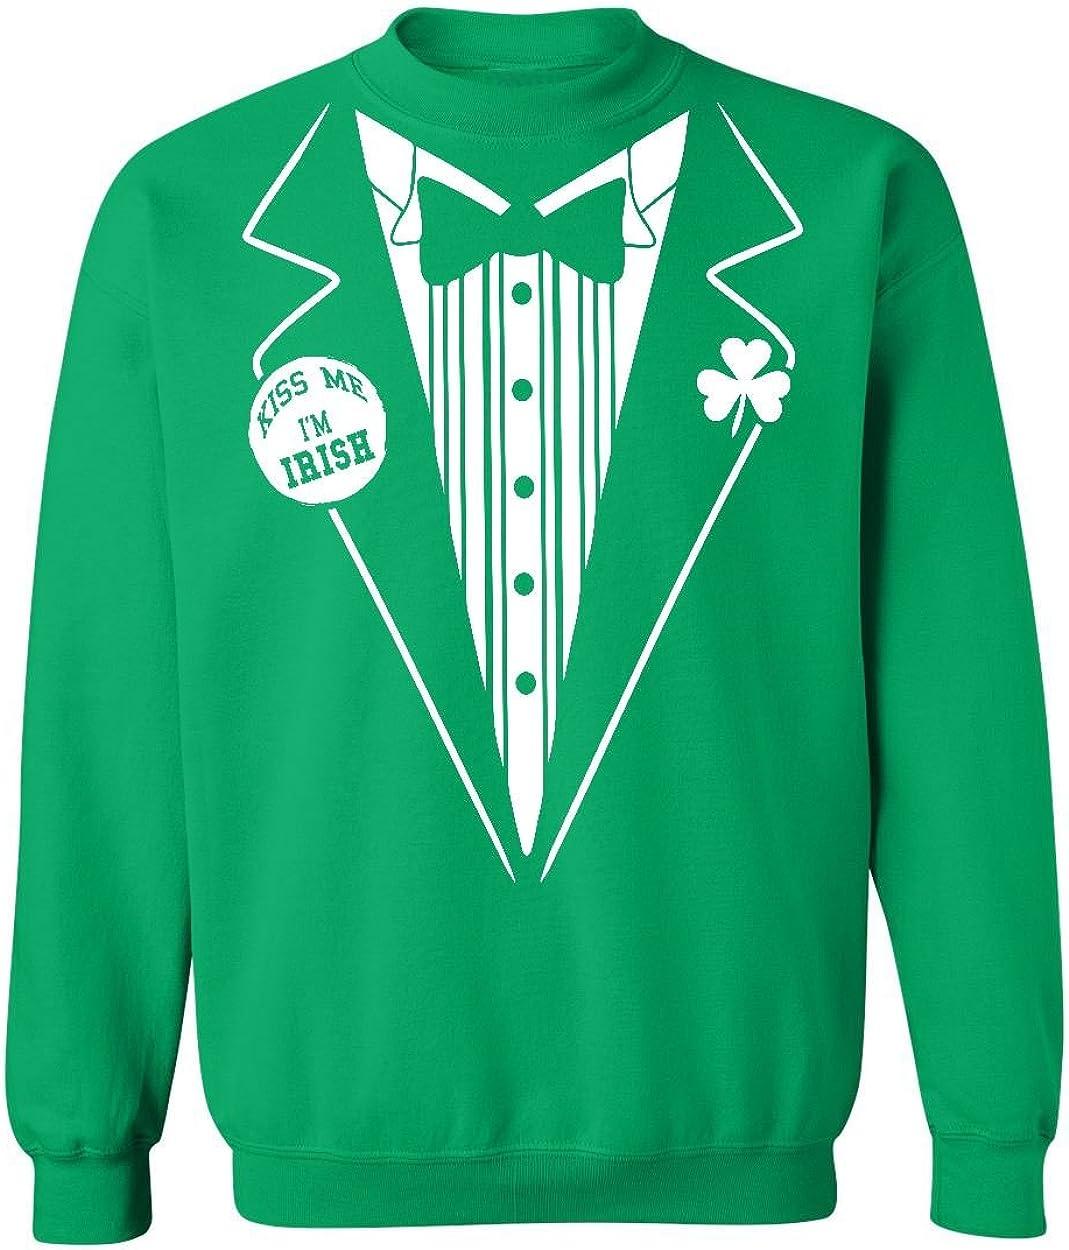 P&B Irish Tuxedo Kiss Me St Patrick's Day Crewneck Sweatshirt